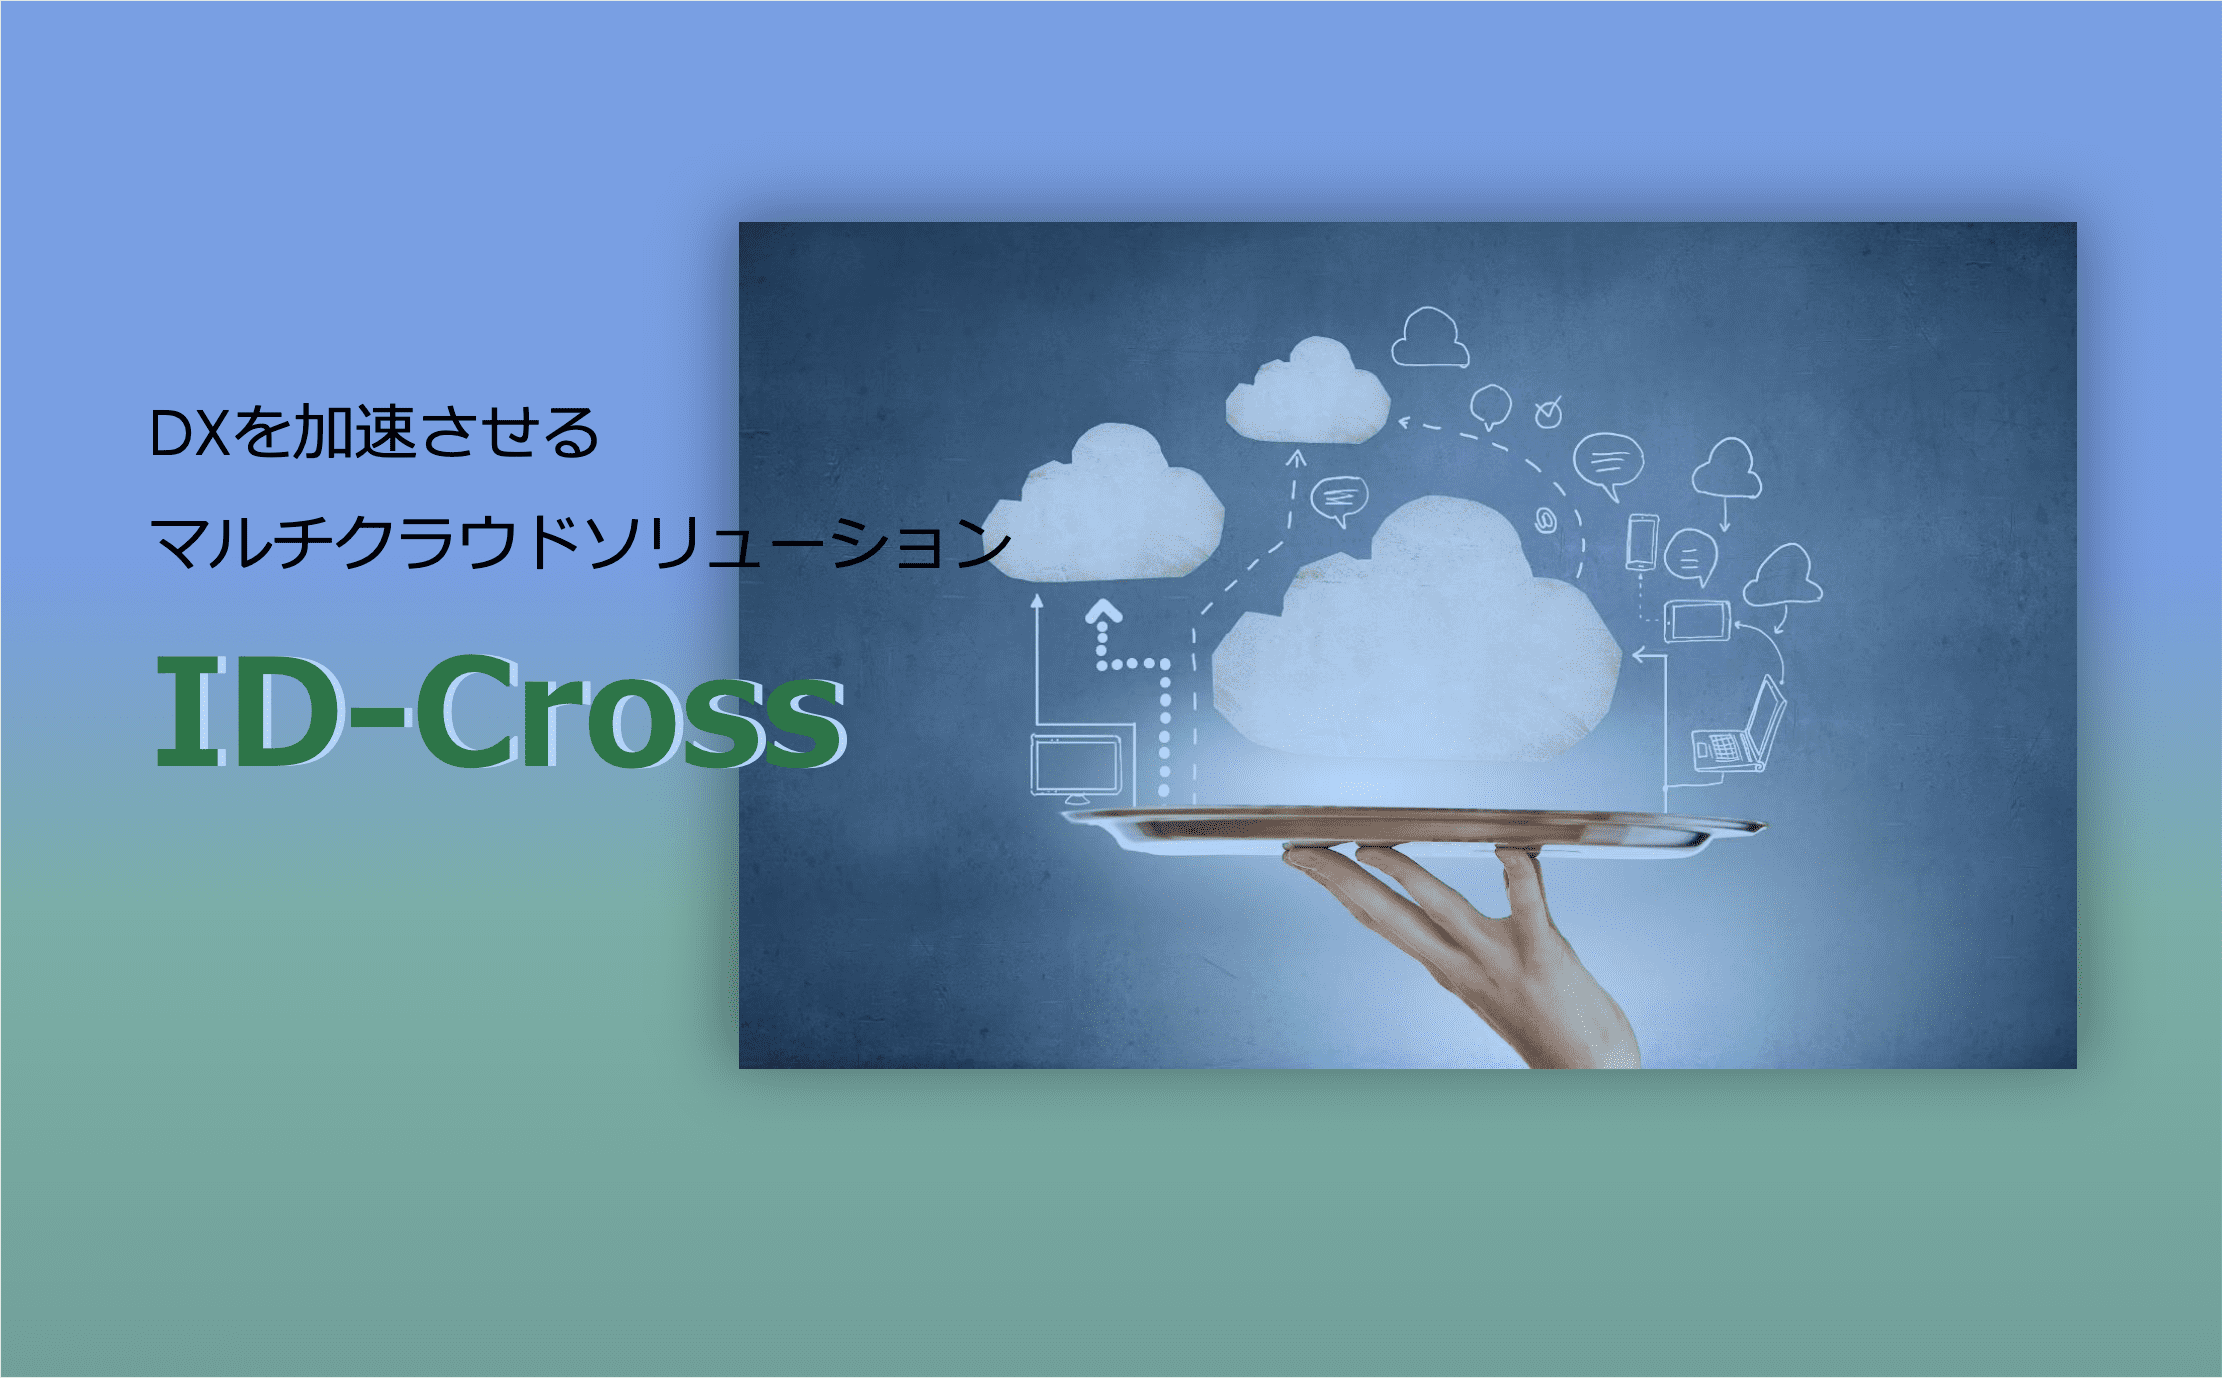 ID-Crossリーフレット表紙